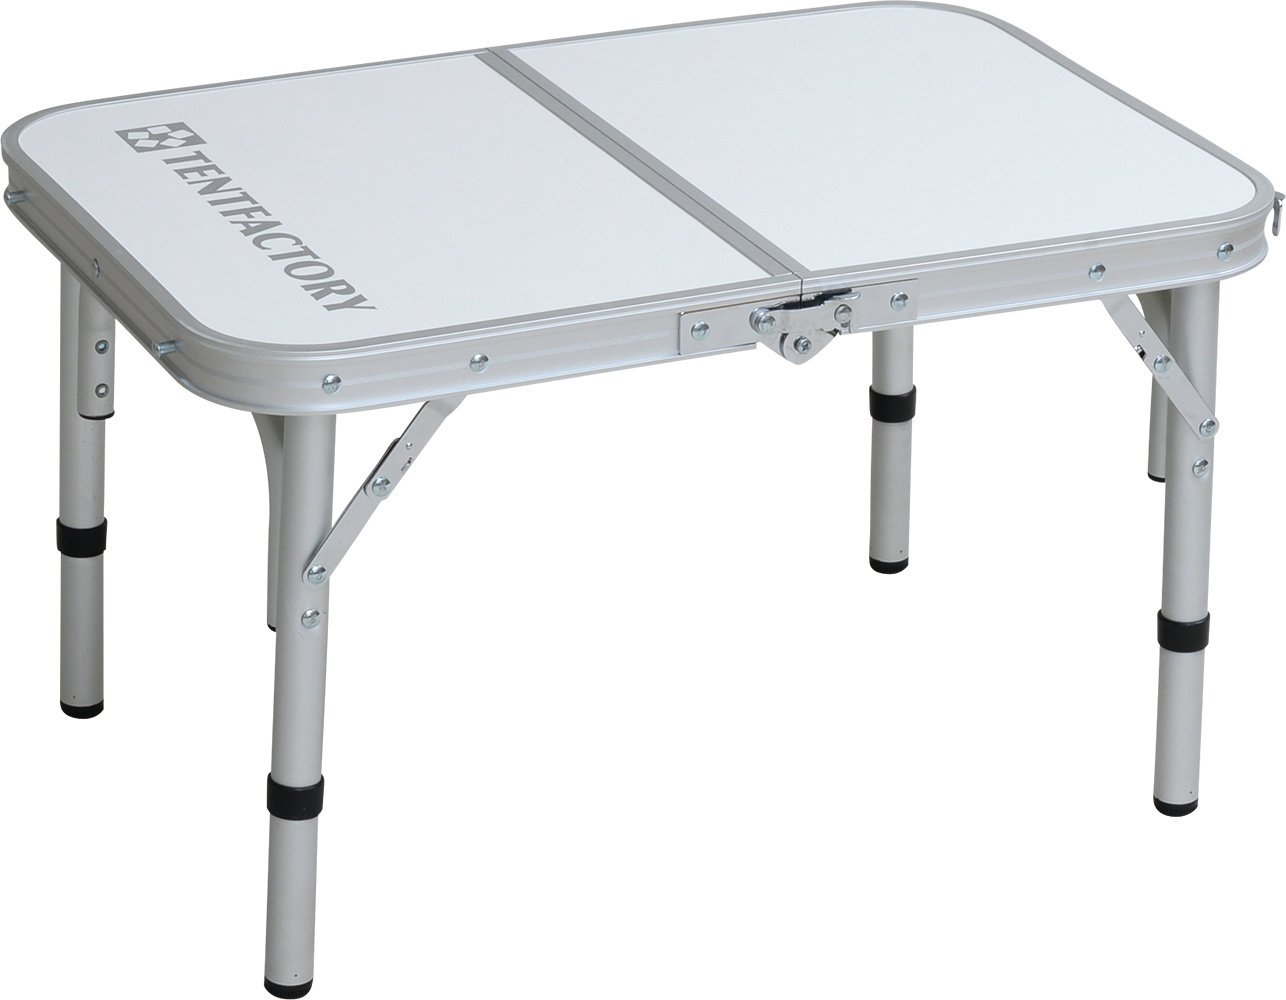 TENT FACTORY (tent factory) dual folding table 6040M White 60 ~ 40 ~ 35 (25) cm TF-DFT6040M-WH